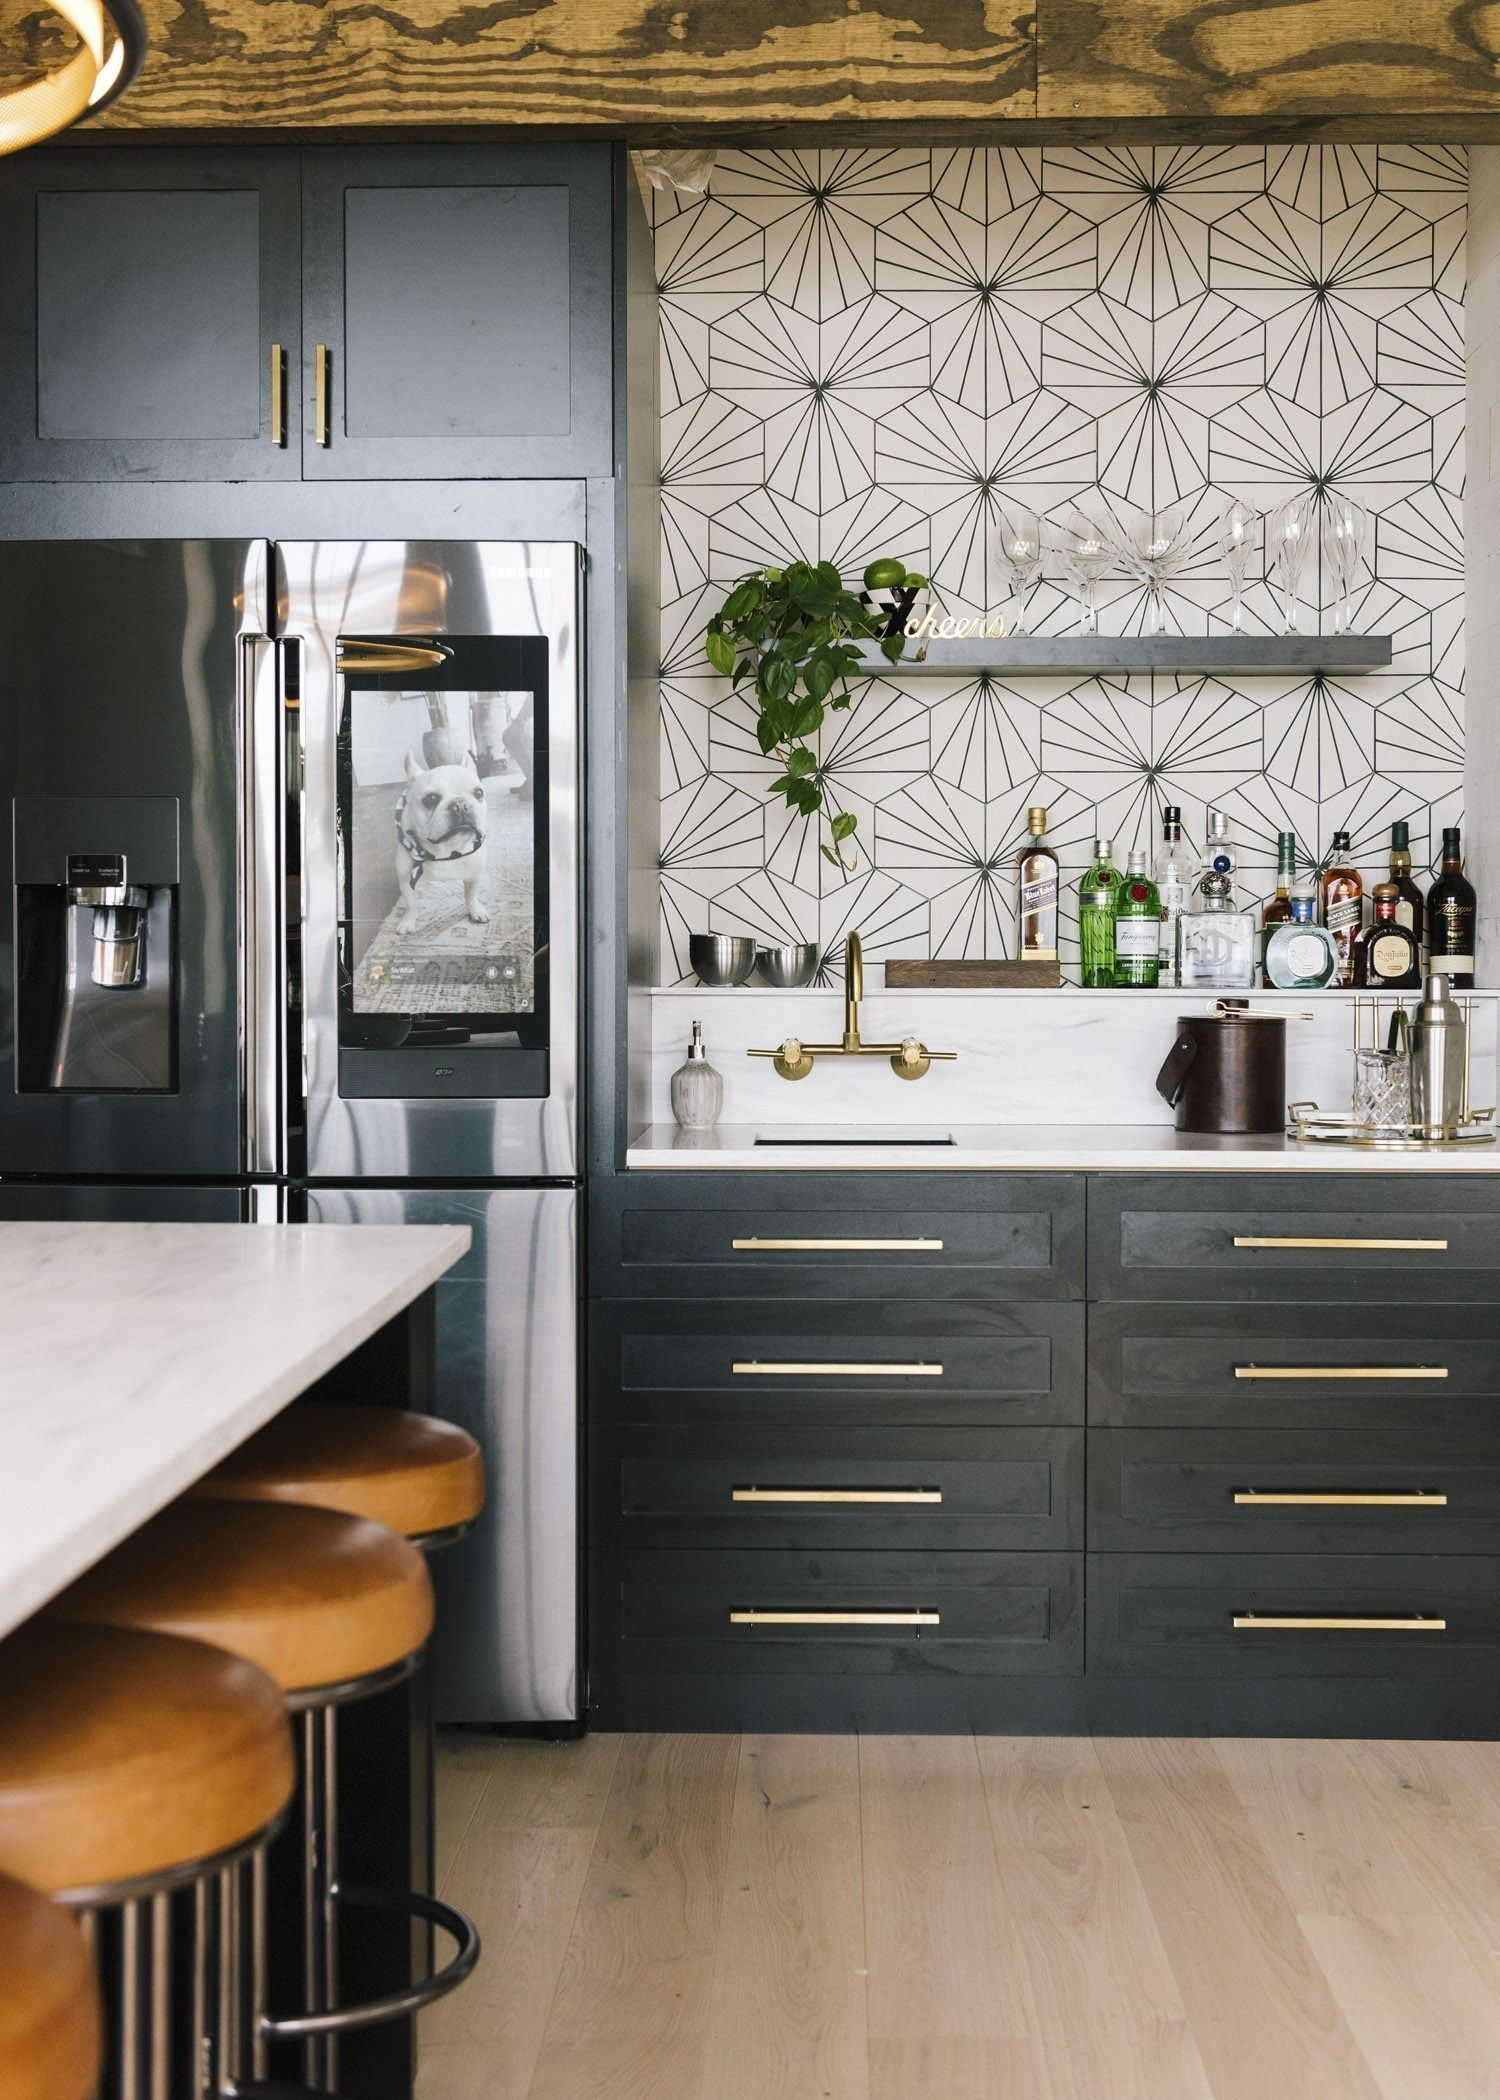 30 Awesome Home Design Ideas Kitchen In 2020 Modern Kitchen Design Kitchen Inspiration Design Interior Design Kitchen